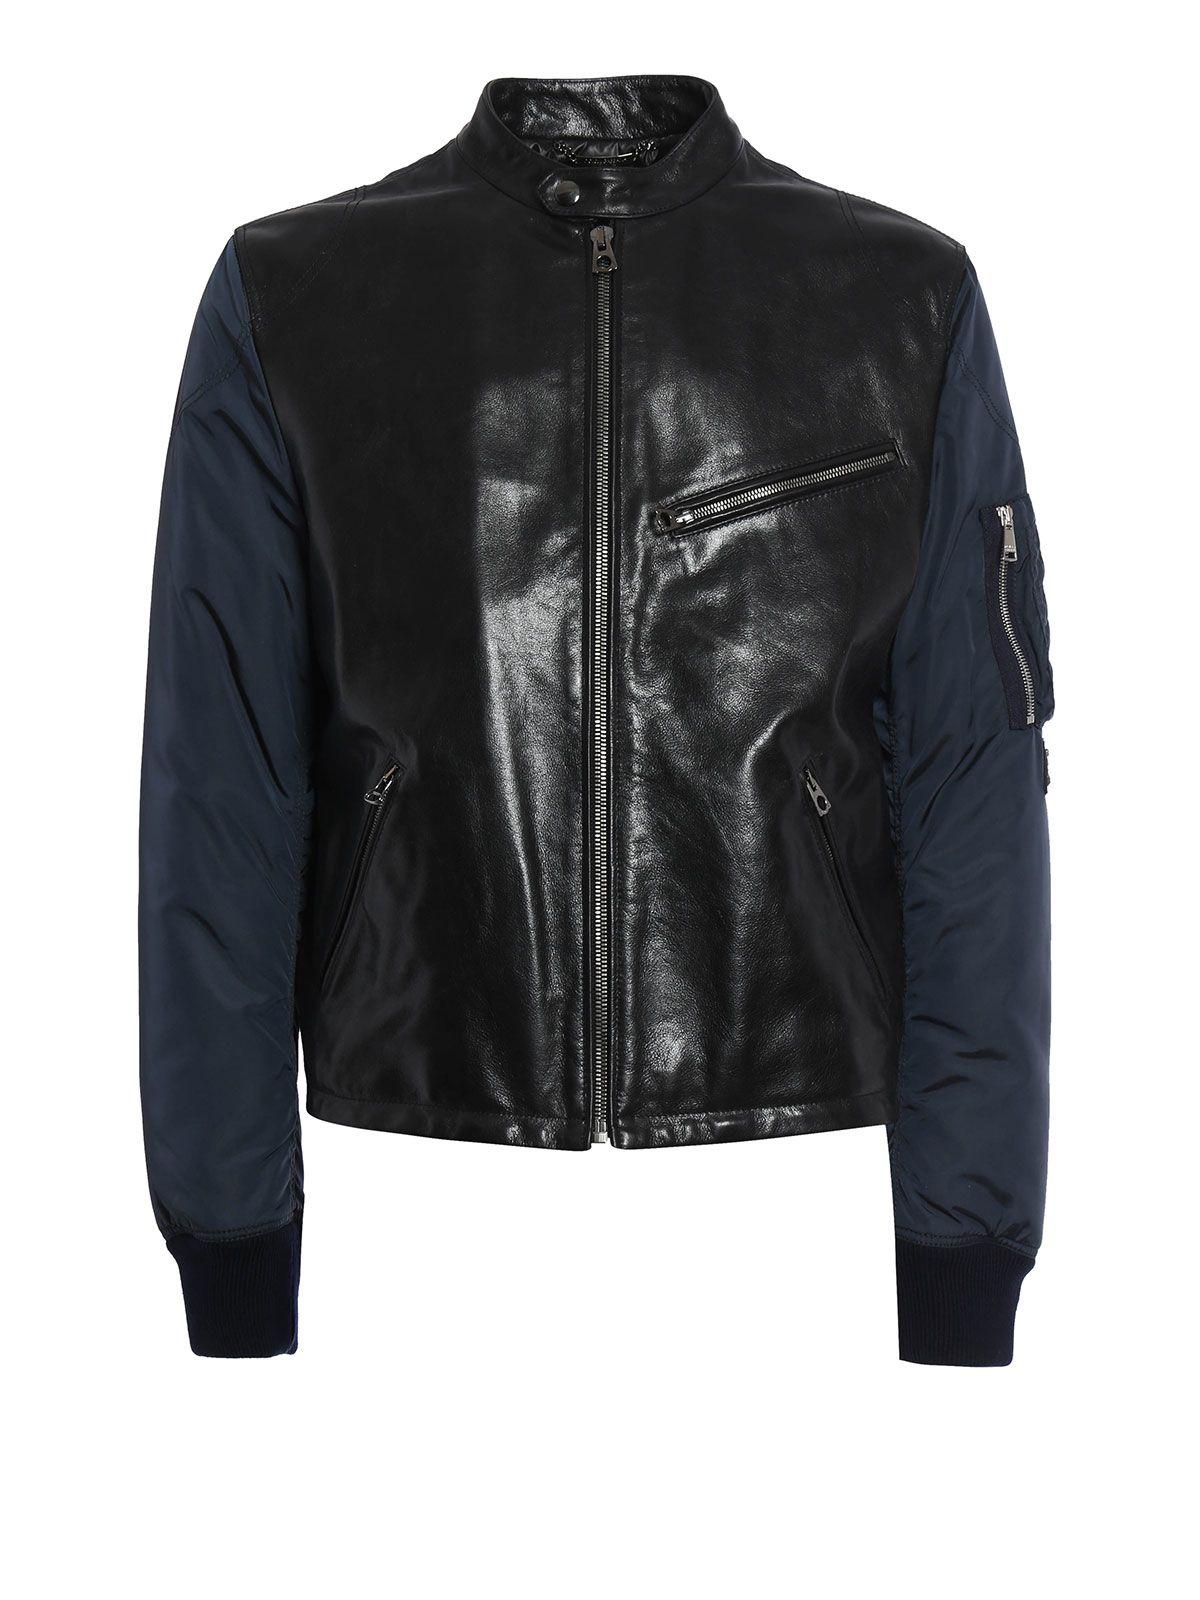 Dolce & Gabbana Leather+corduroy Jkt